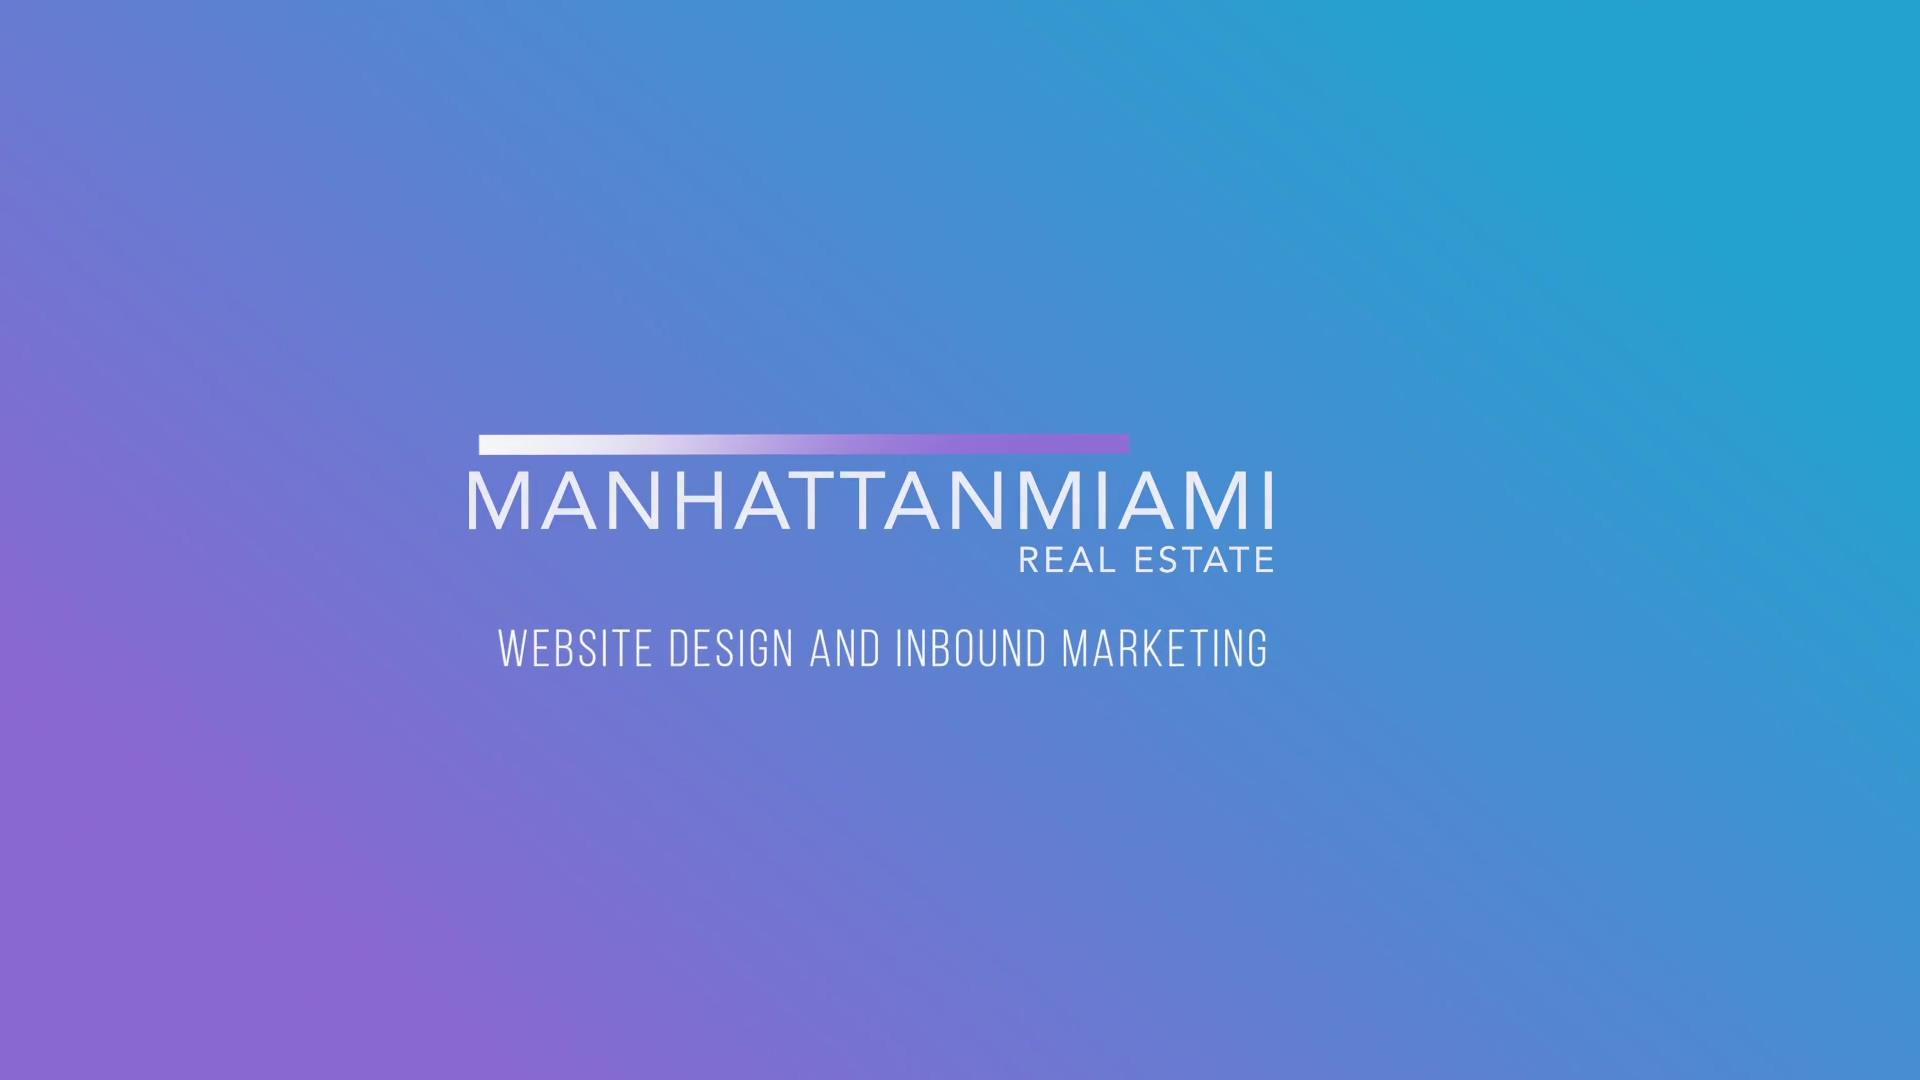 manhattan_miami_success_stories